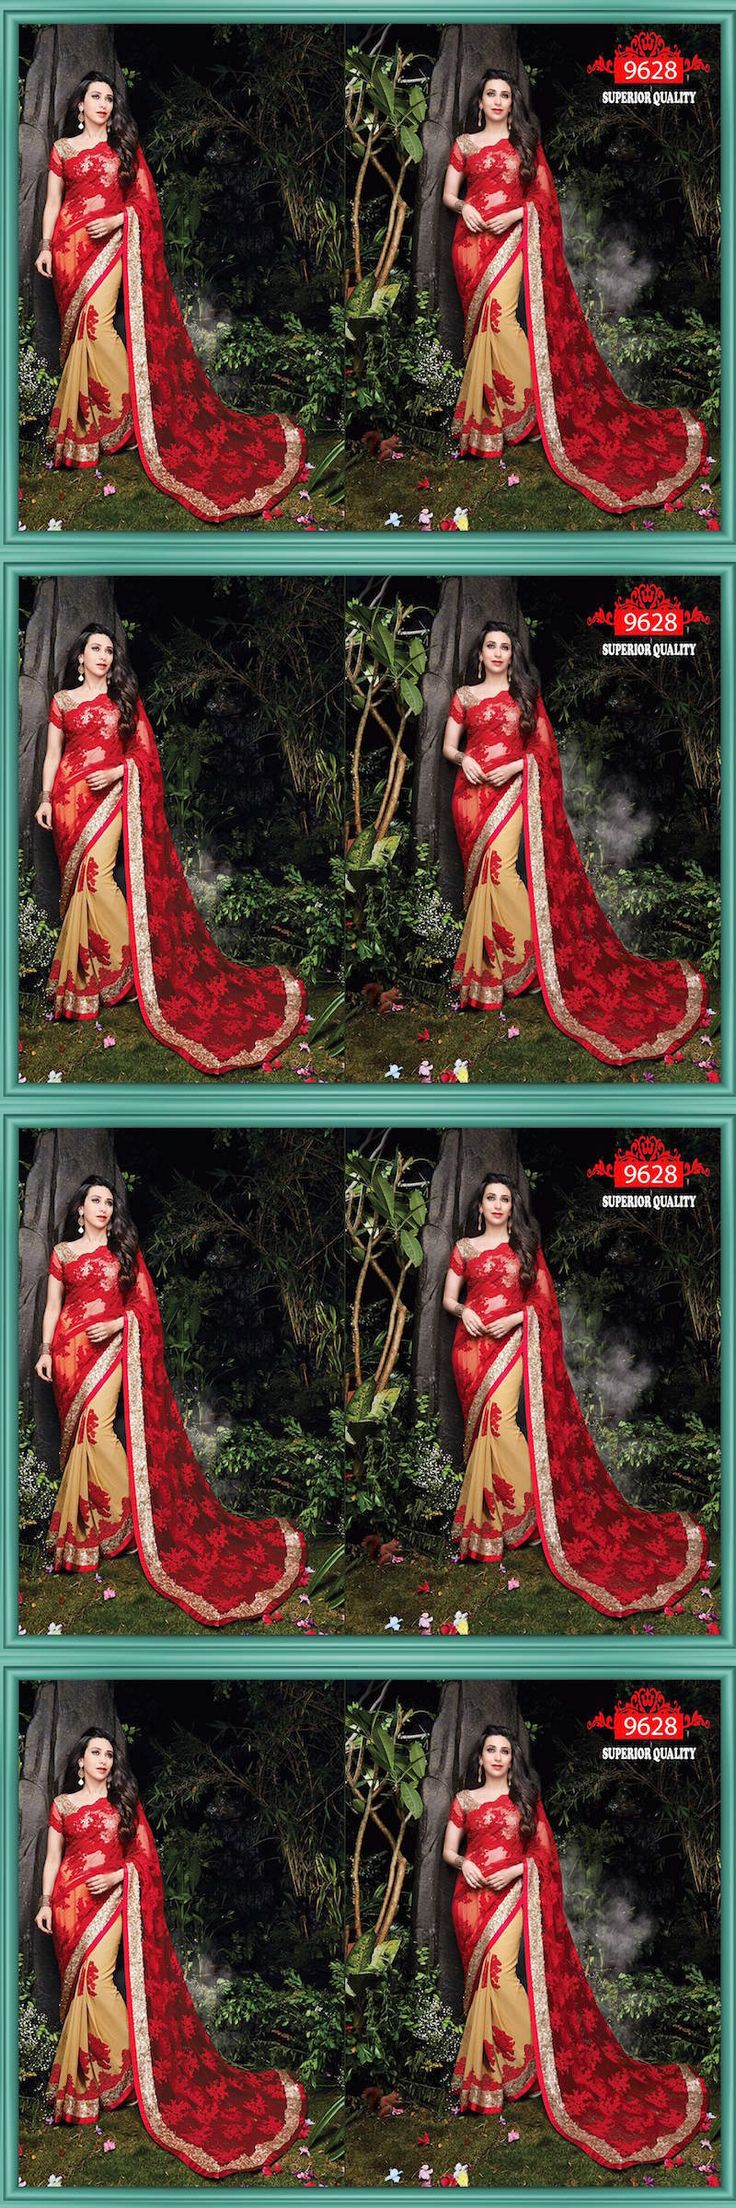 Sari Saree 155250: Designer Party Wear Wedding Indian Pakistani Saree Sari Bollywood Ethnic Lehenga -> BUY IT NOW ONLY: $64.25 on eBay!